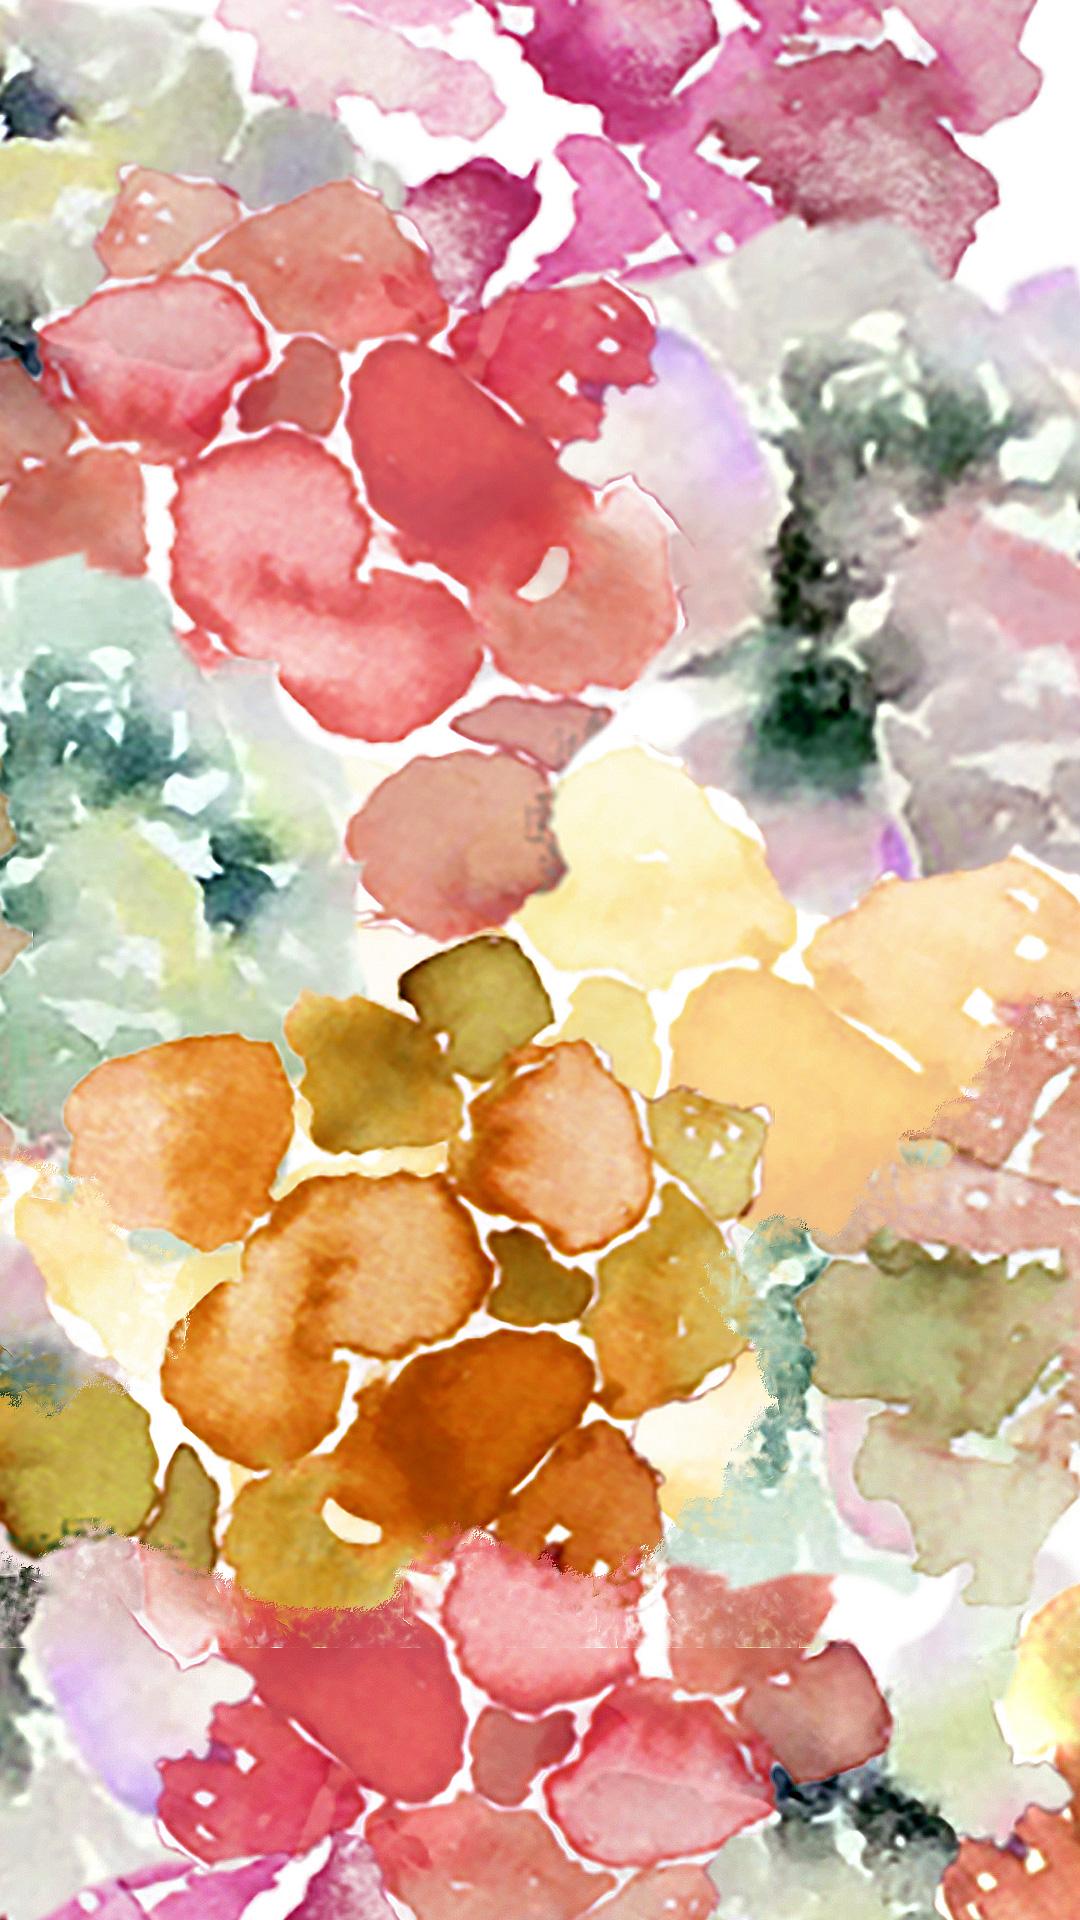 Chic Iphone Wallpaper   1080x1920   Download HD Wallpaper 1080x1920